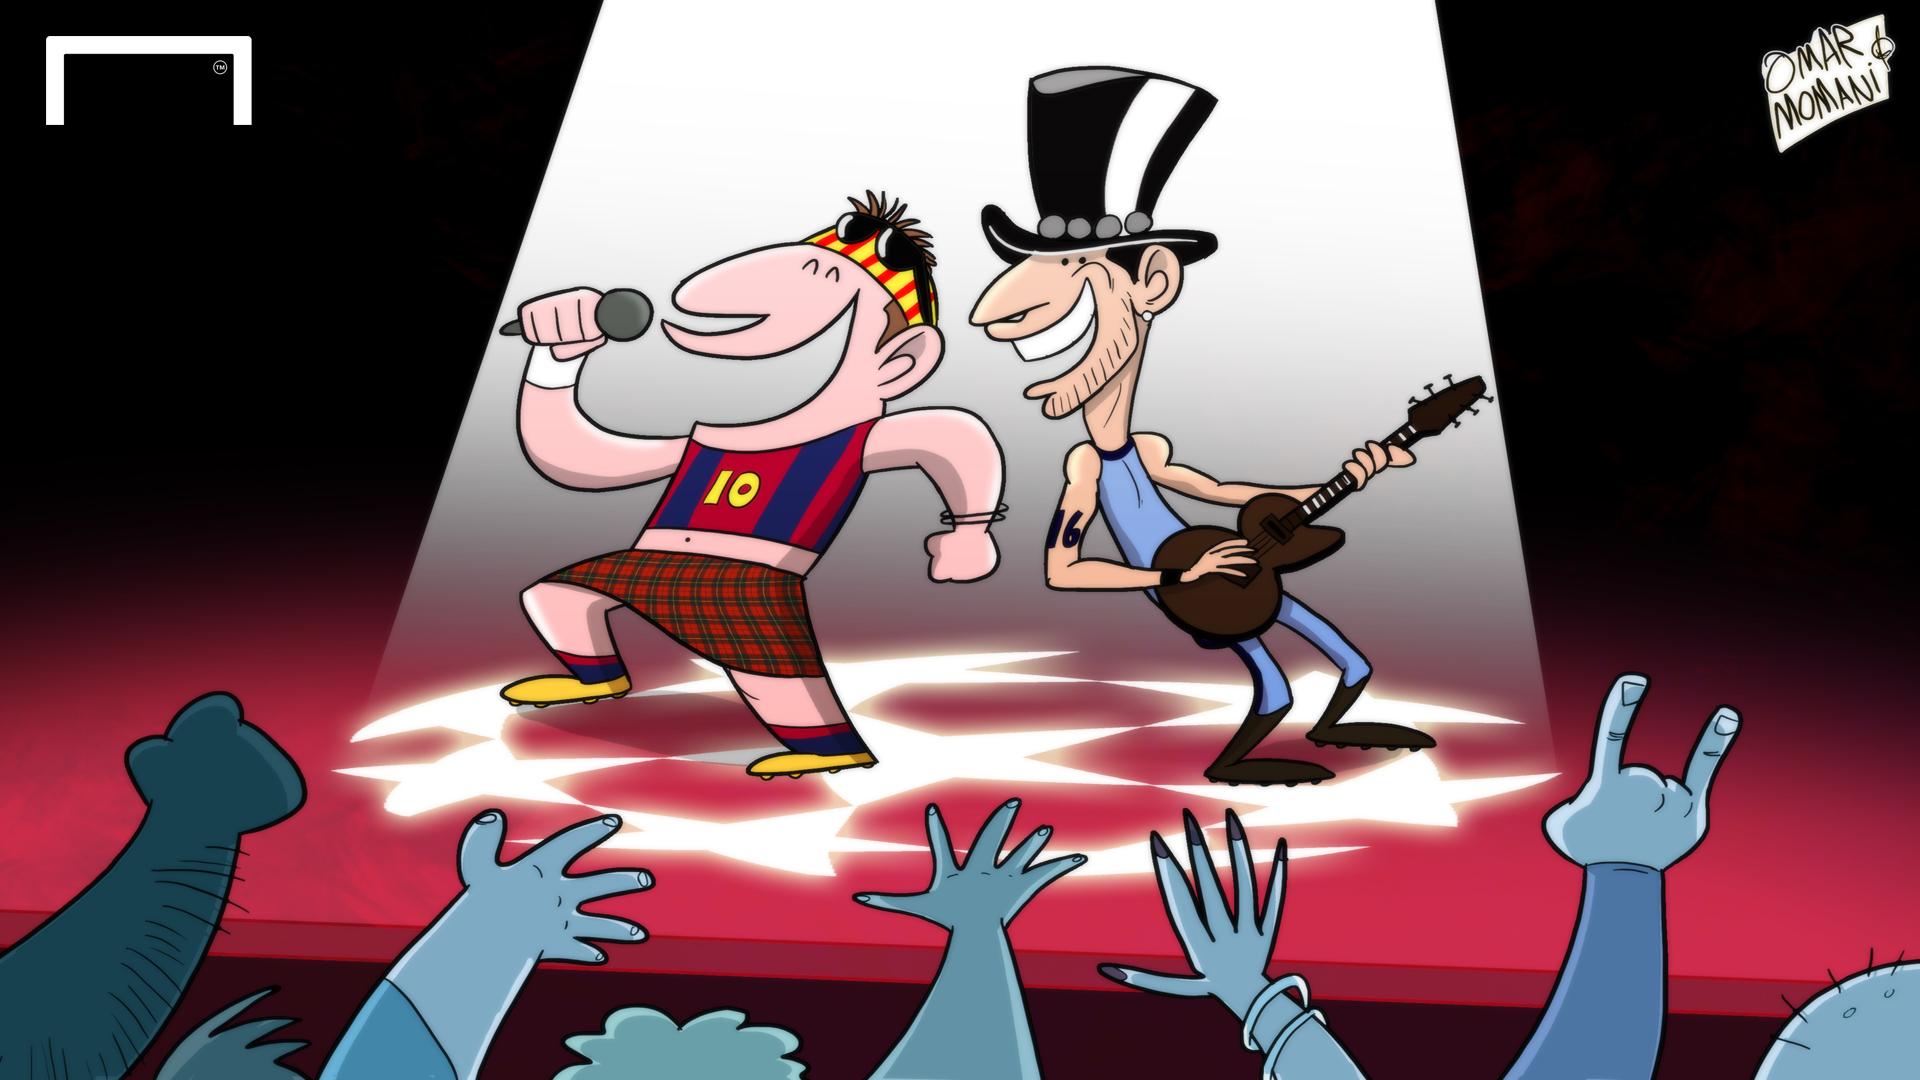 Серхио Агуэро, Лига чемпионов, Лионель Месси, Барселона, Манчестер Сити